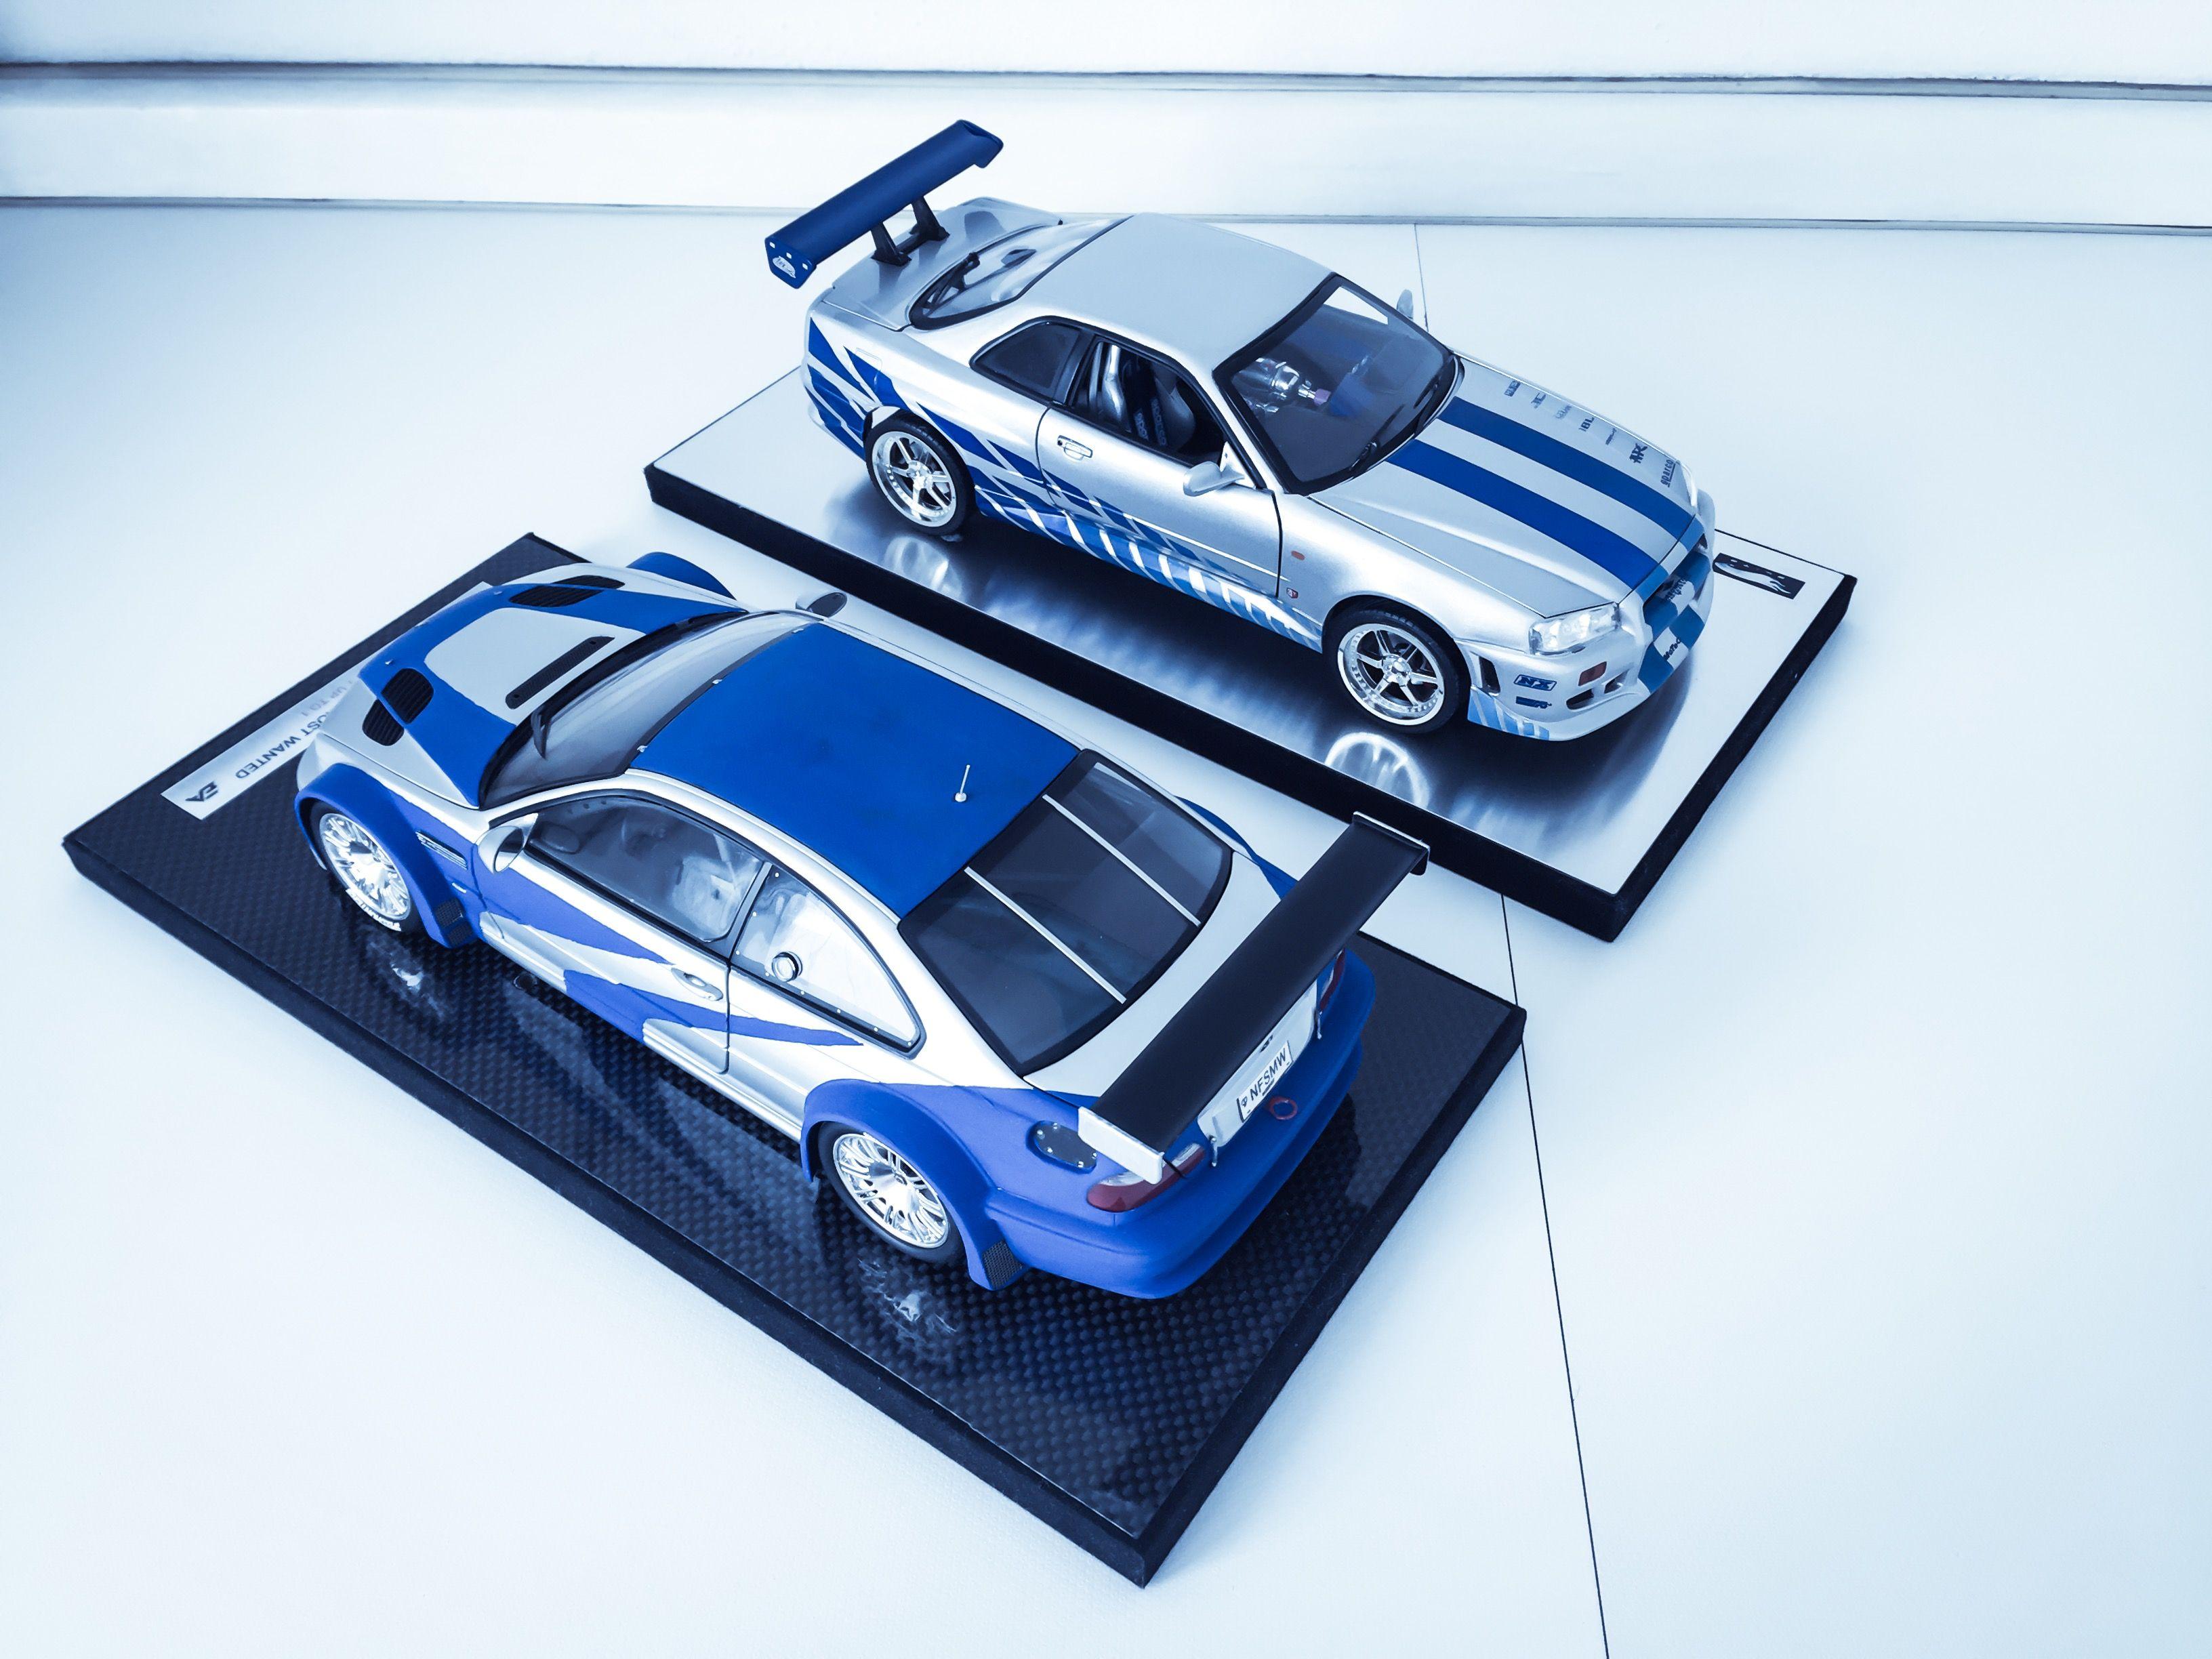 Bmw M3 Gtr Nfsmw Nissan Skyline Gtr 34 F F2 Carros